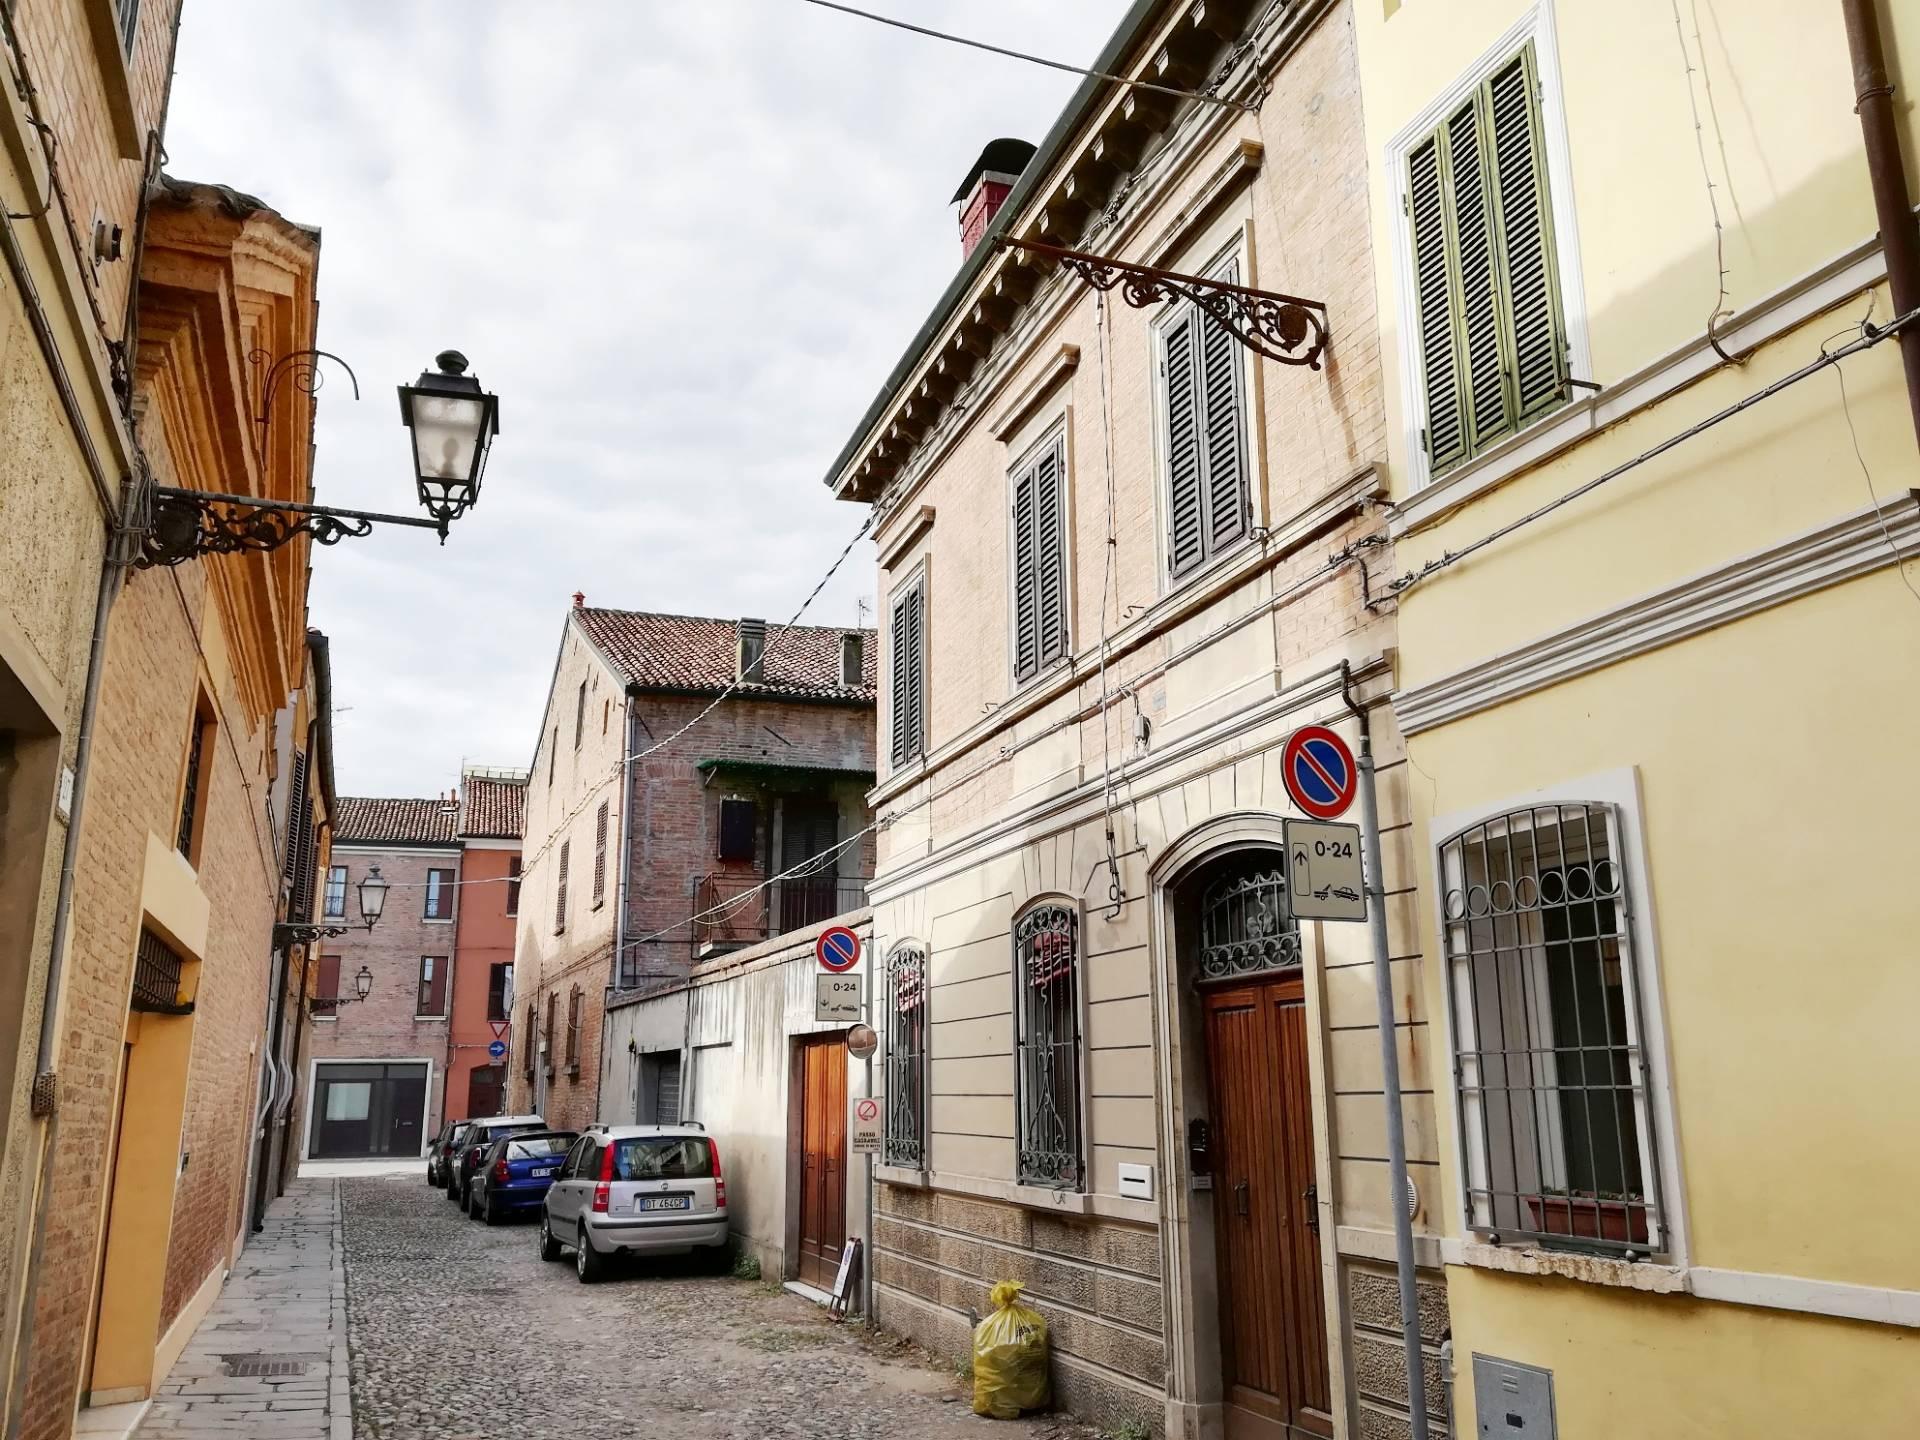 Ufficio Turismo A Ferrara : Appartamento a ferrara fe . case a ferrara fe ilovecasa.eu